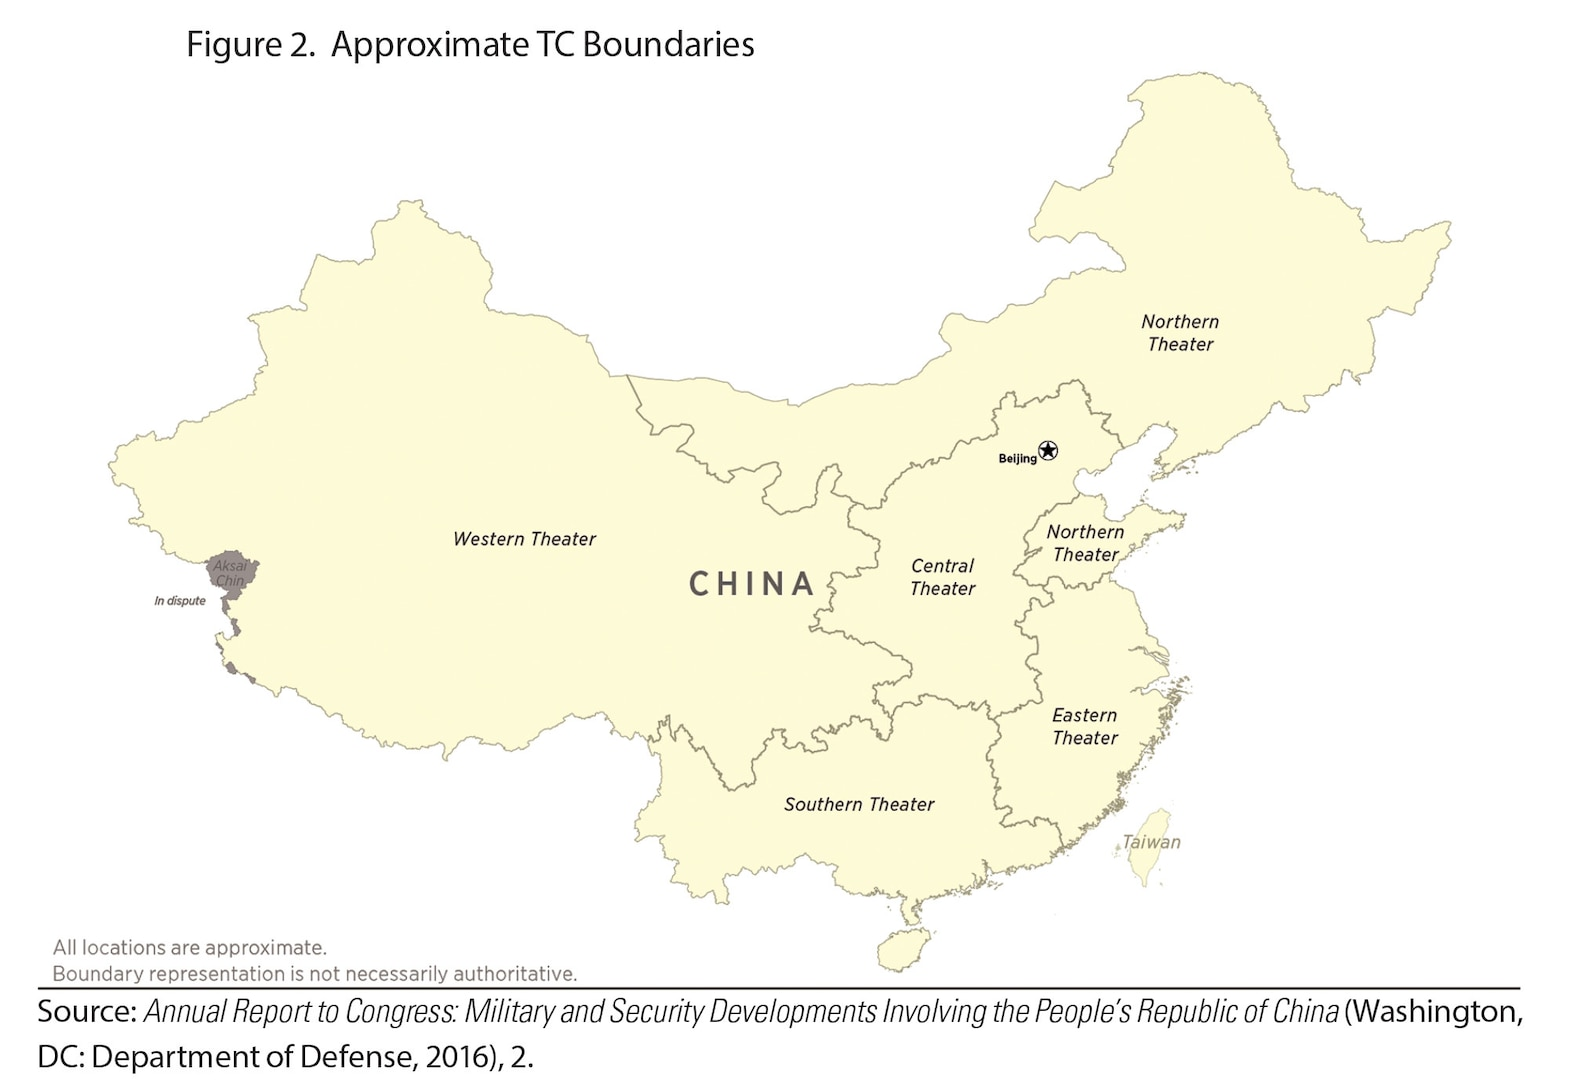 Figure 2. Approximate TC Boundaries